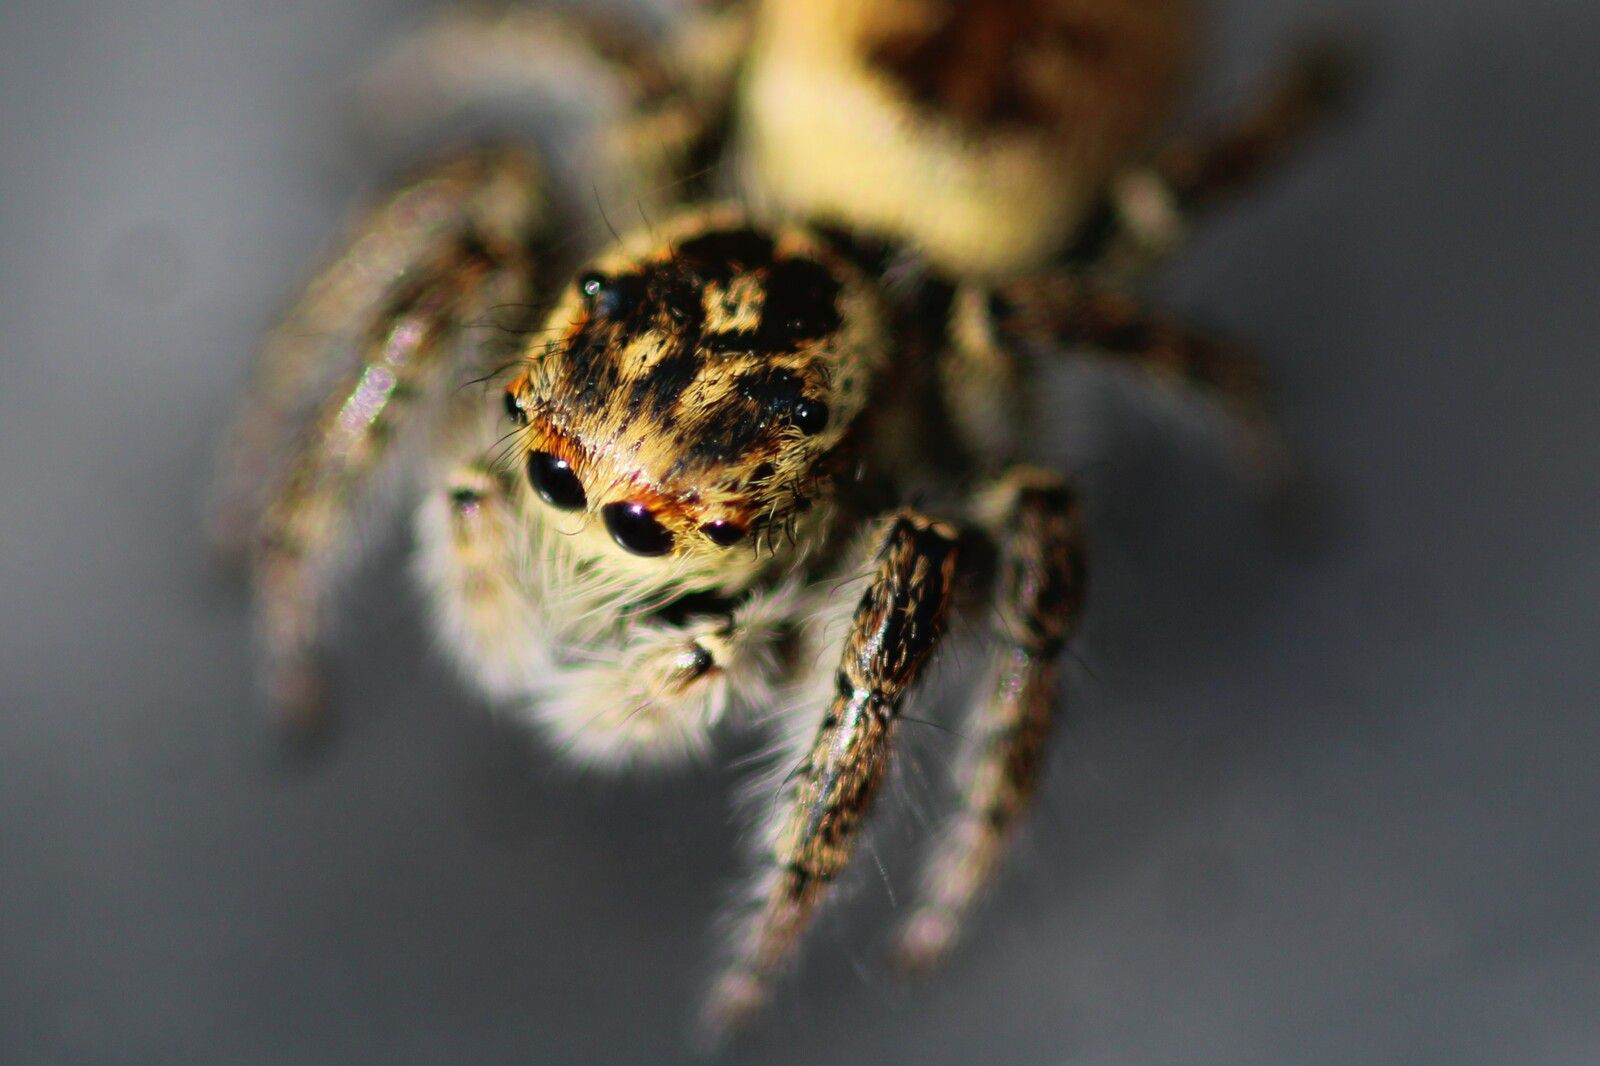 femelle de carrhotus xanthogramma